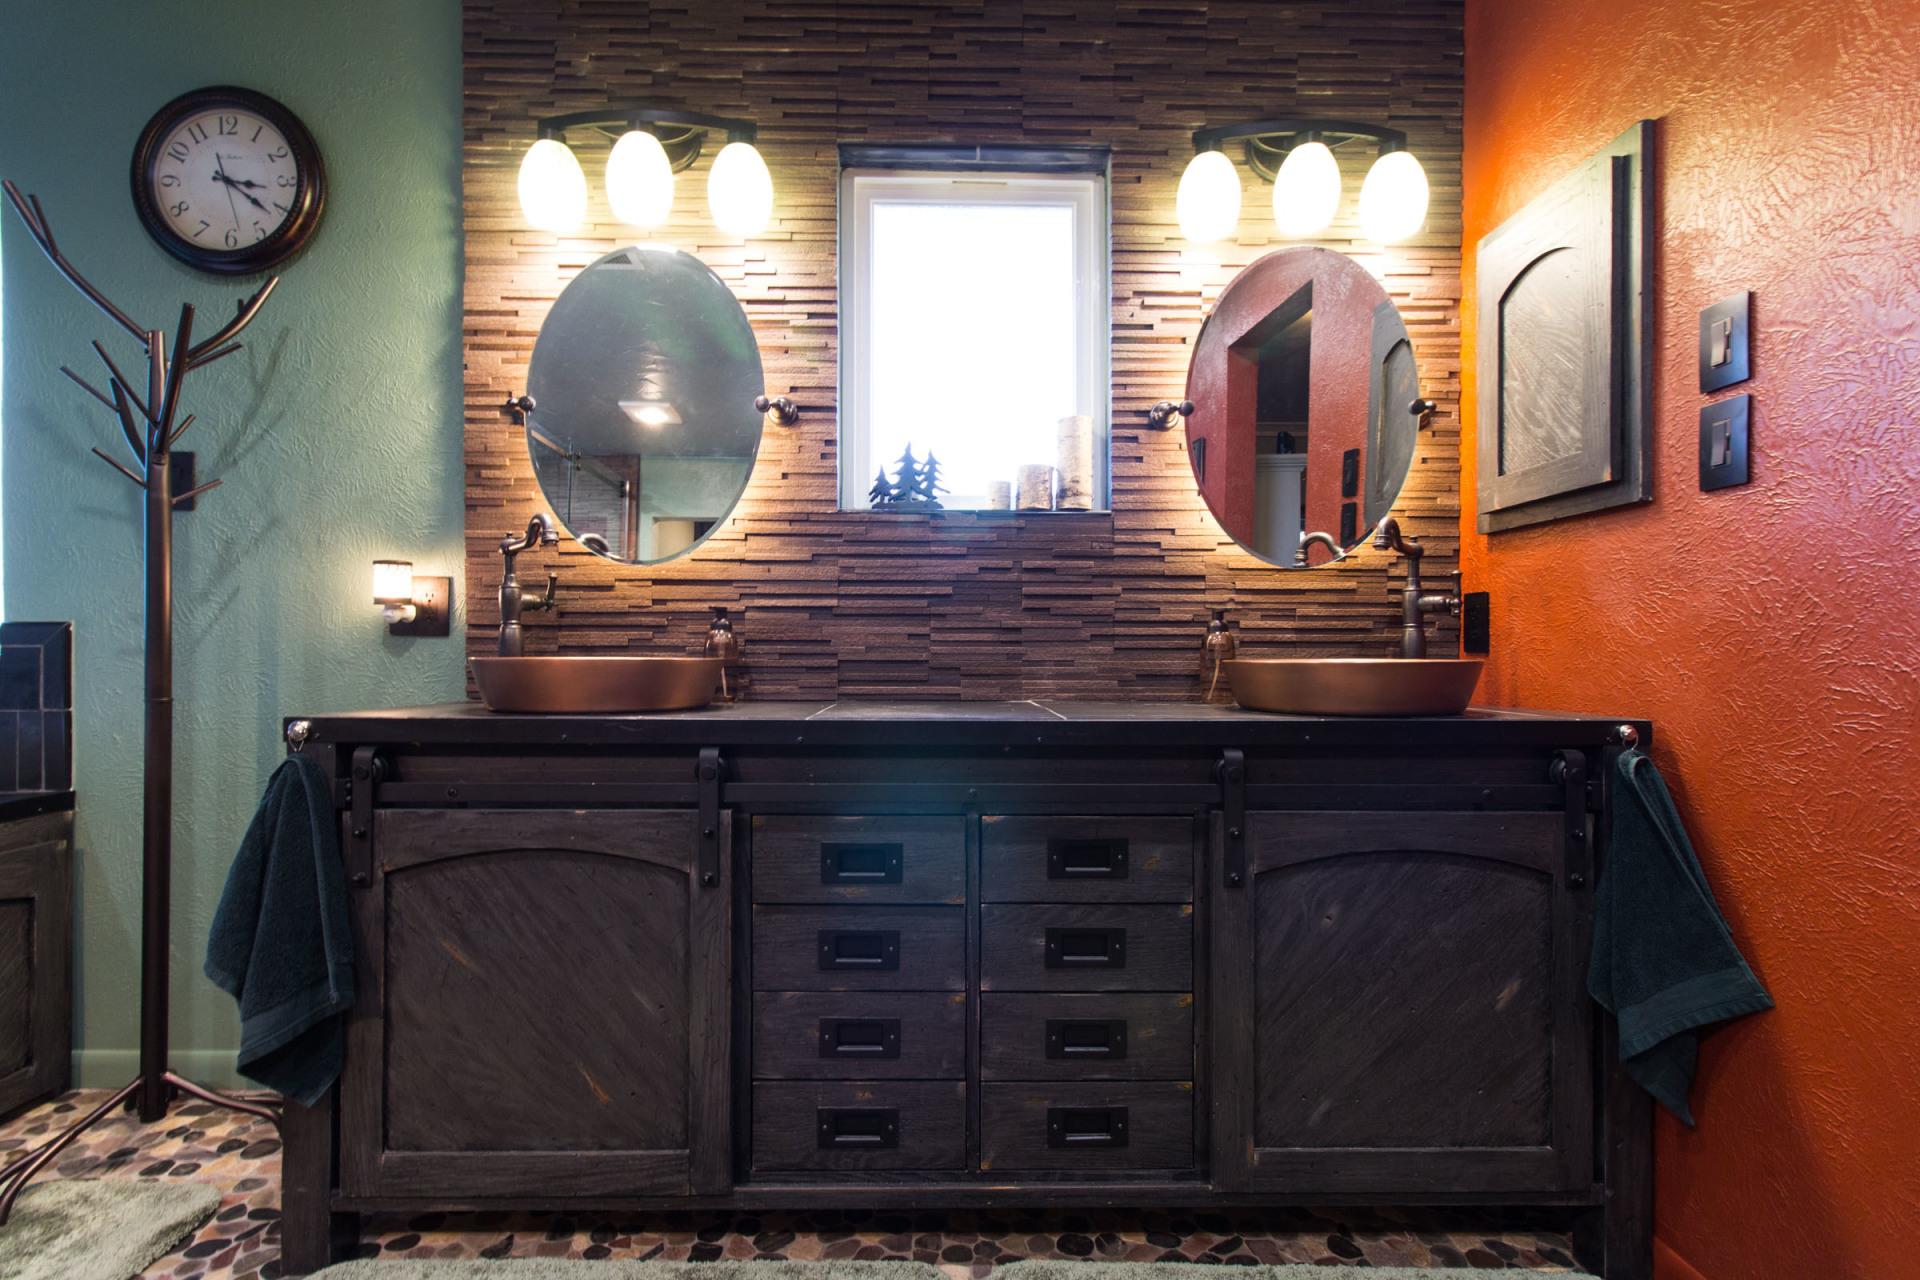 jarrell-signature-mountain-oasis-bathroom-remodel-10